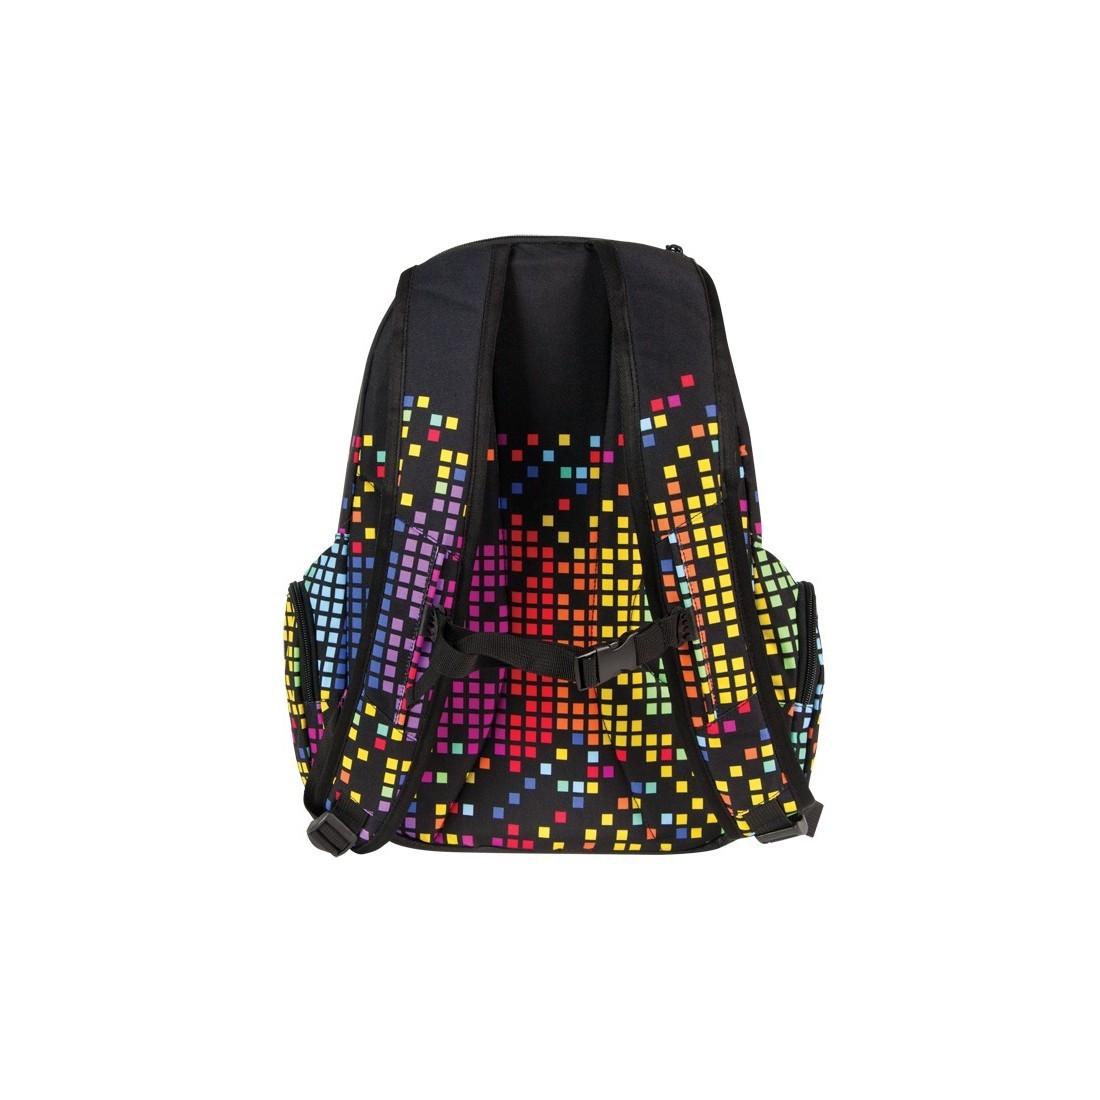 Plecak młodzieżowy duży MTV Coolpack Equalizer - plecak-tornister.pl